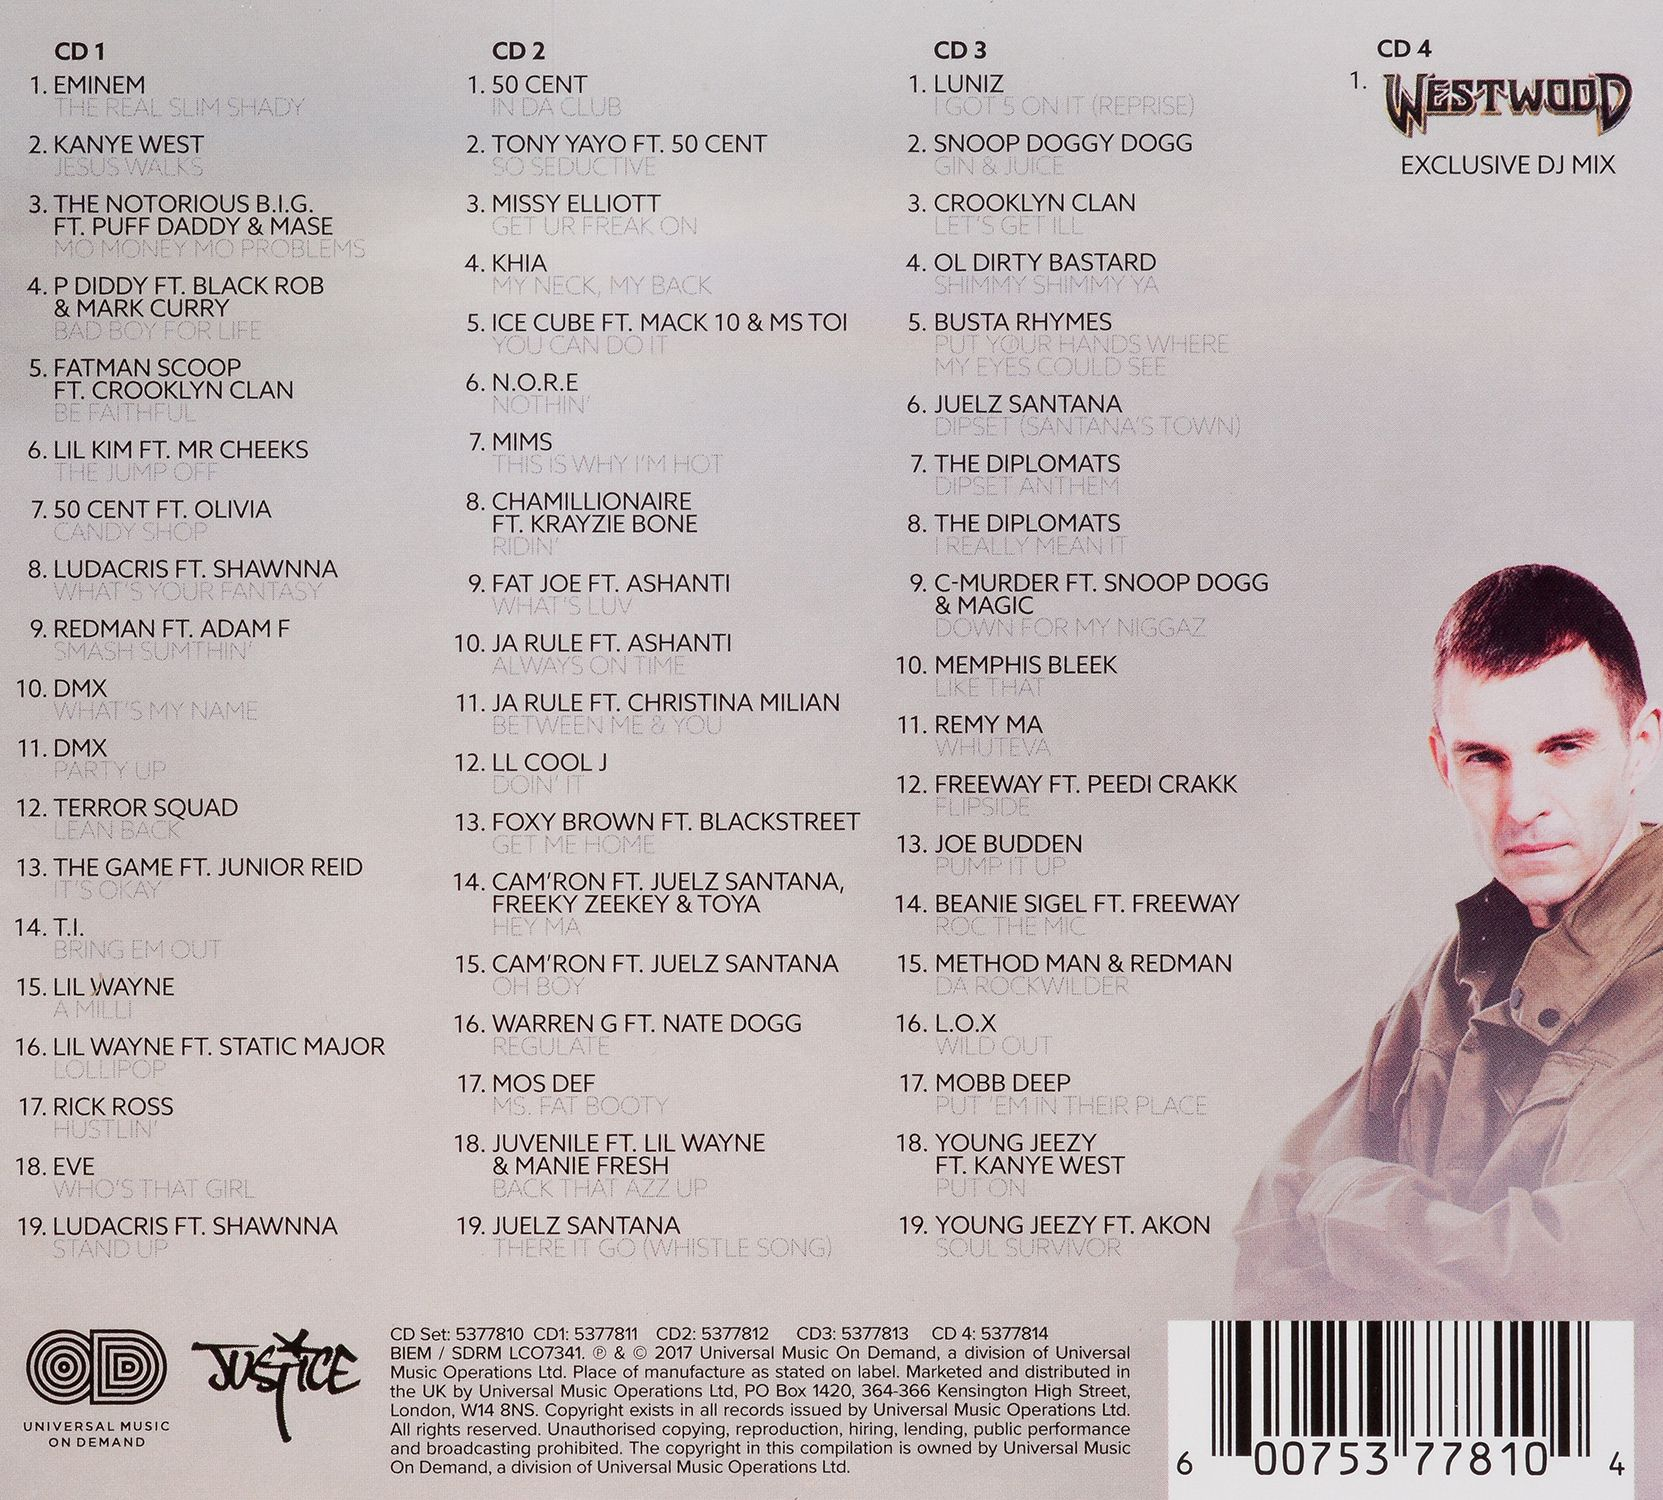 Various Artists - Westwood Hip Hop Club Bangers (CD) - 3